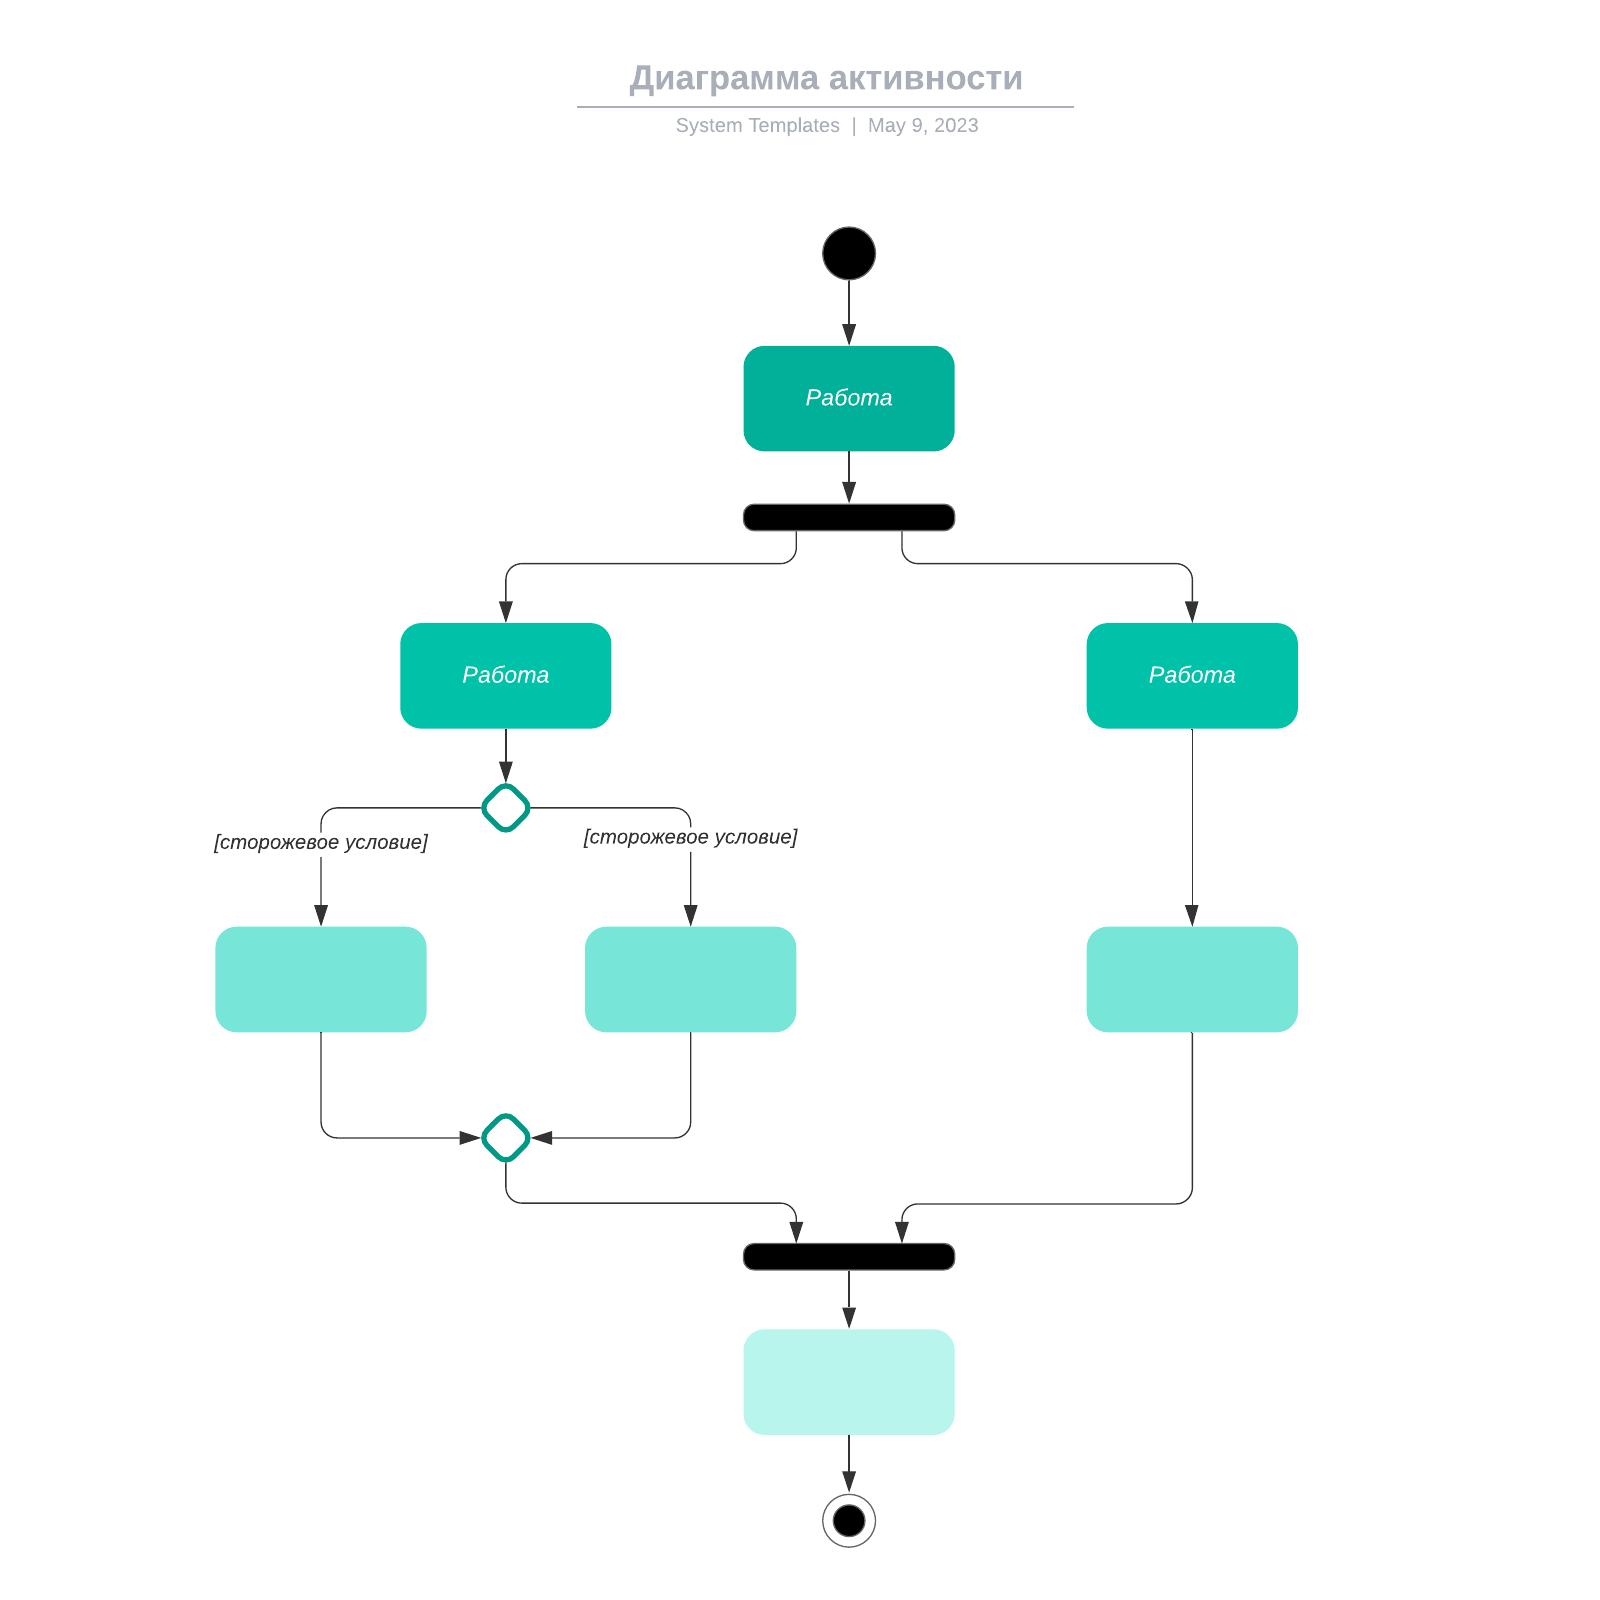 Диаграмма активности